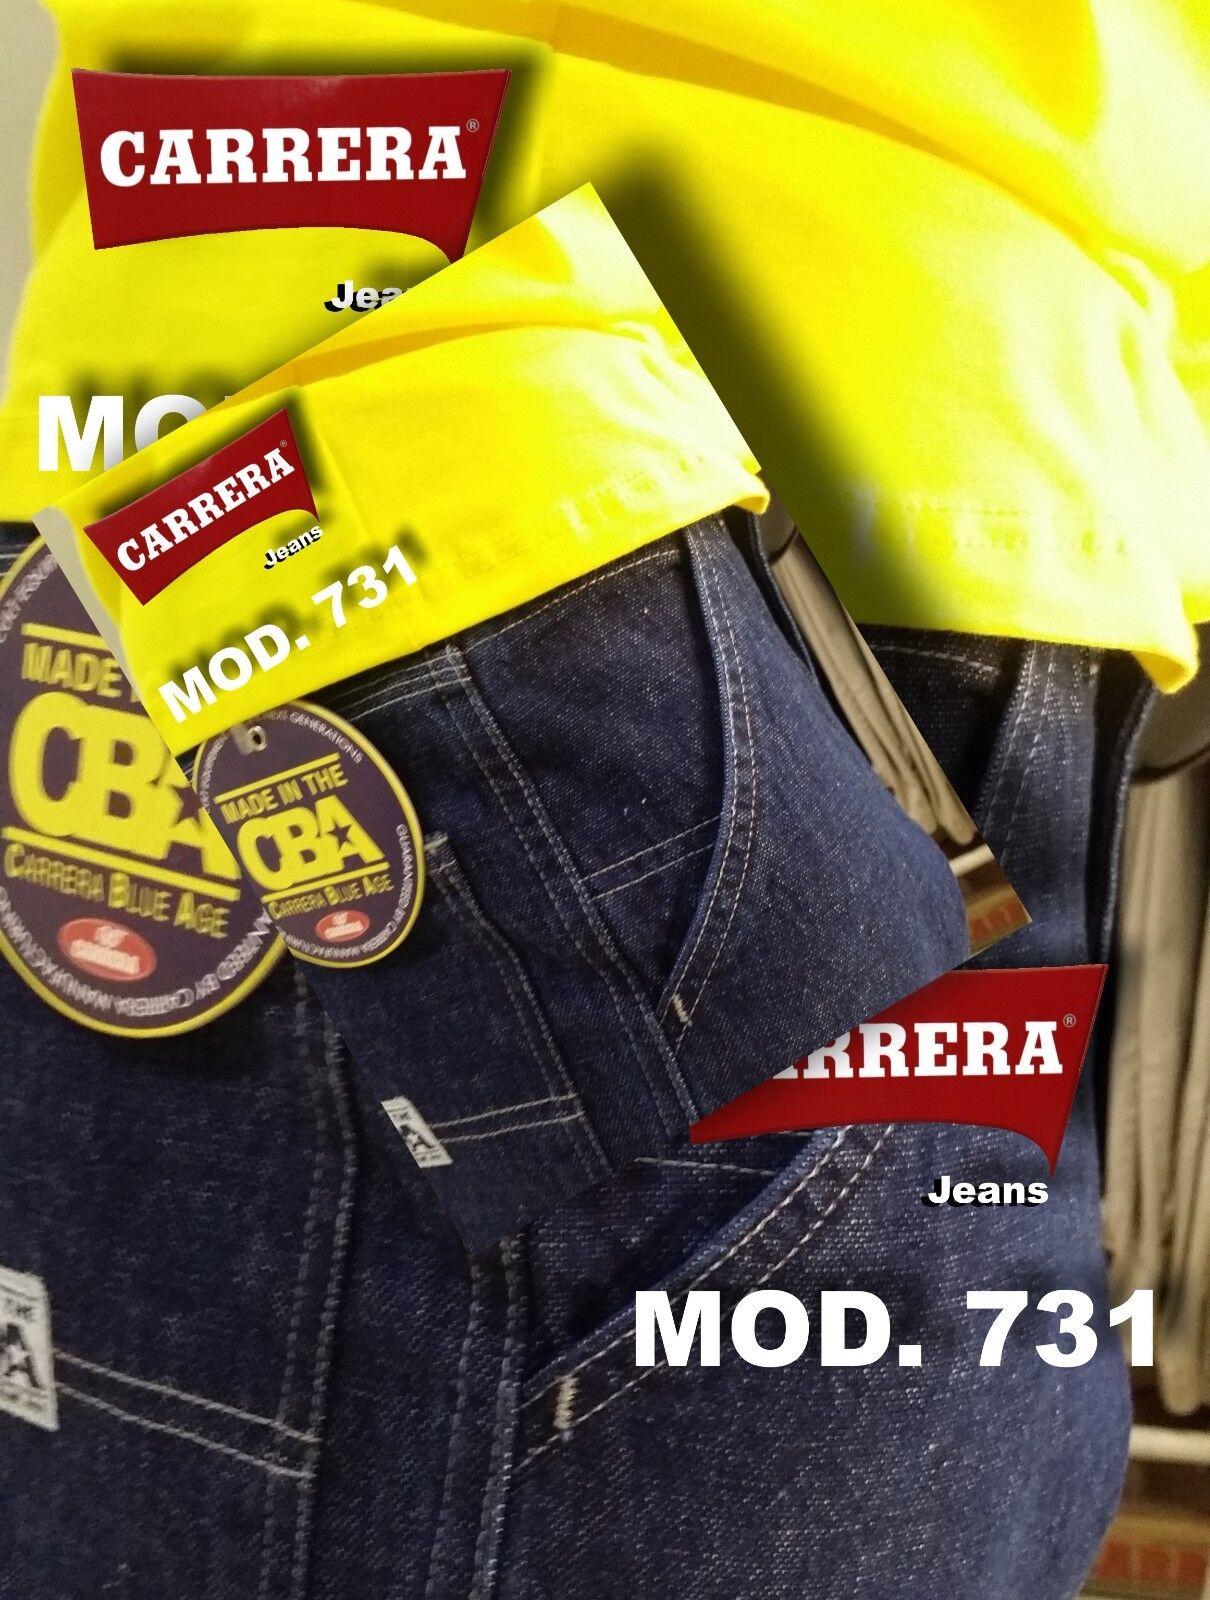 CARRERA MOD. AMERICA 731 STYLE CARPENTER MISURE 46 48 50